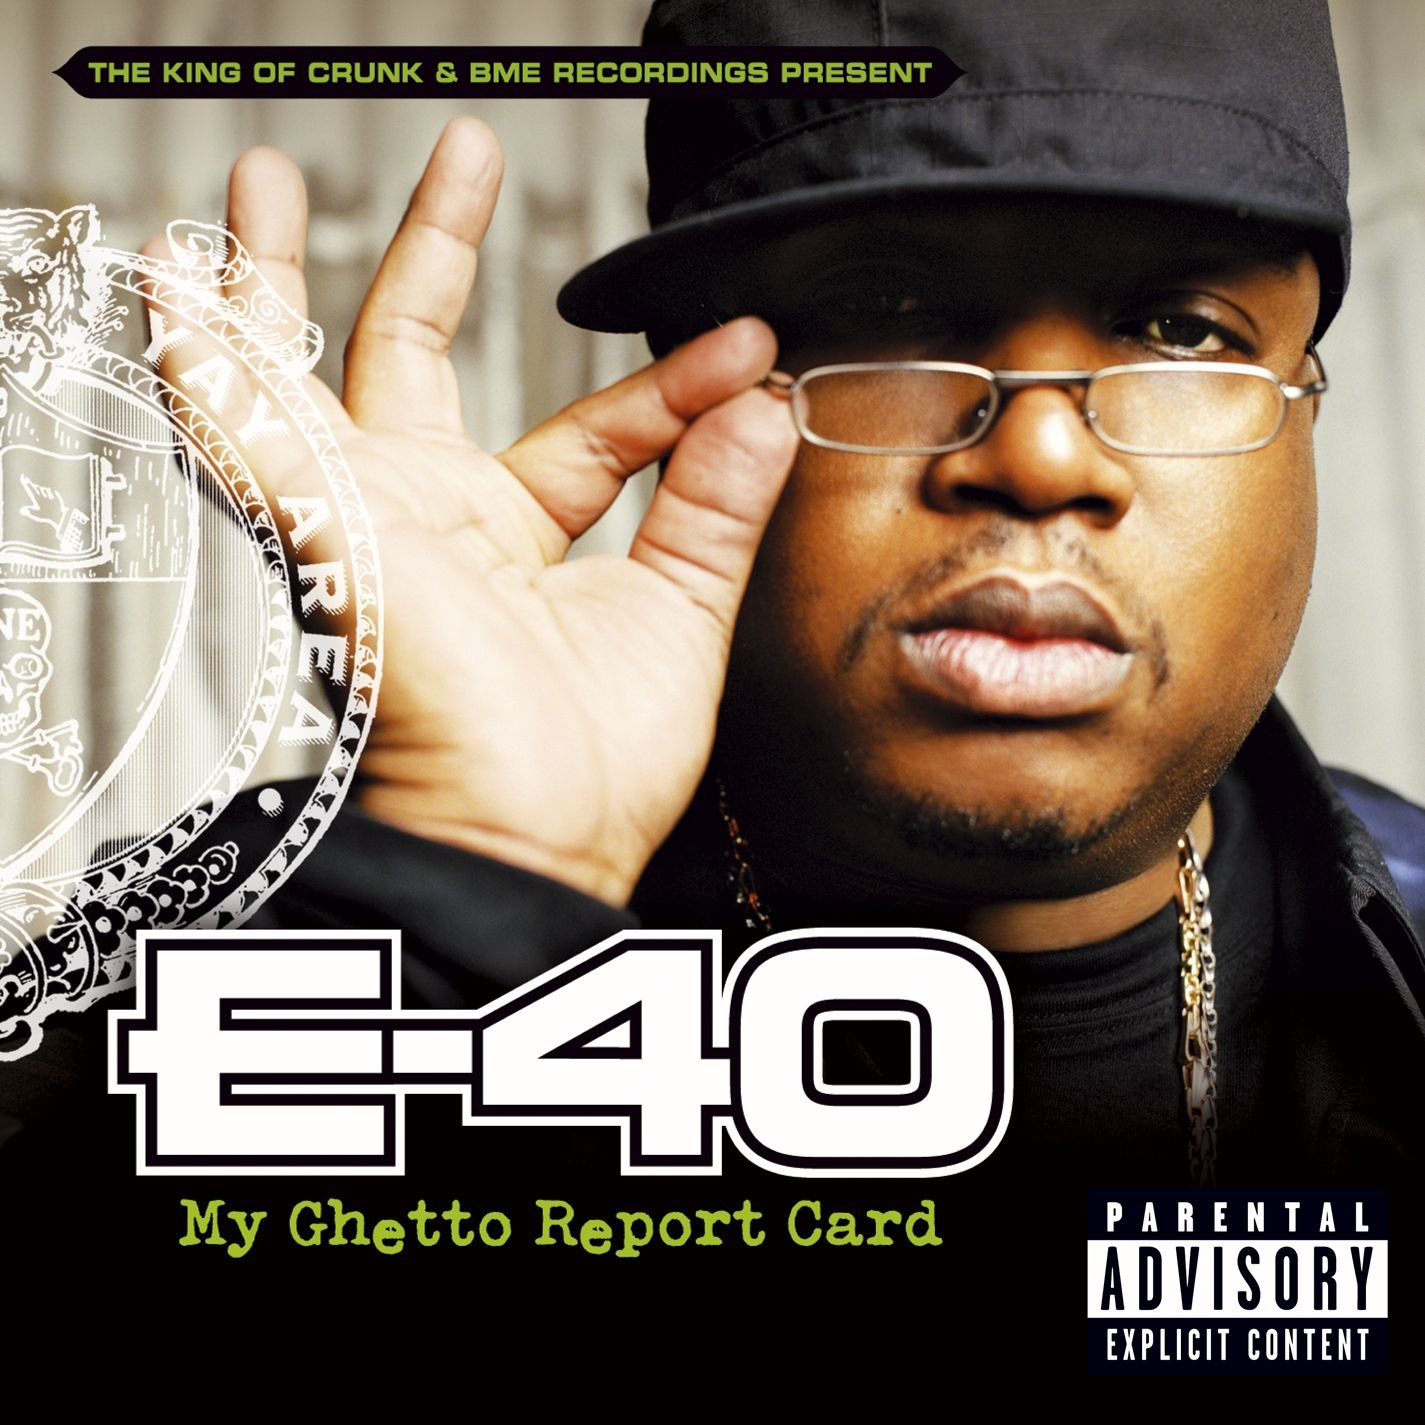 audio review : My Ghetto Report Card ( album ) ... E-40